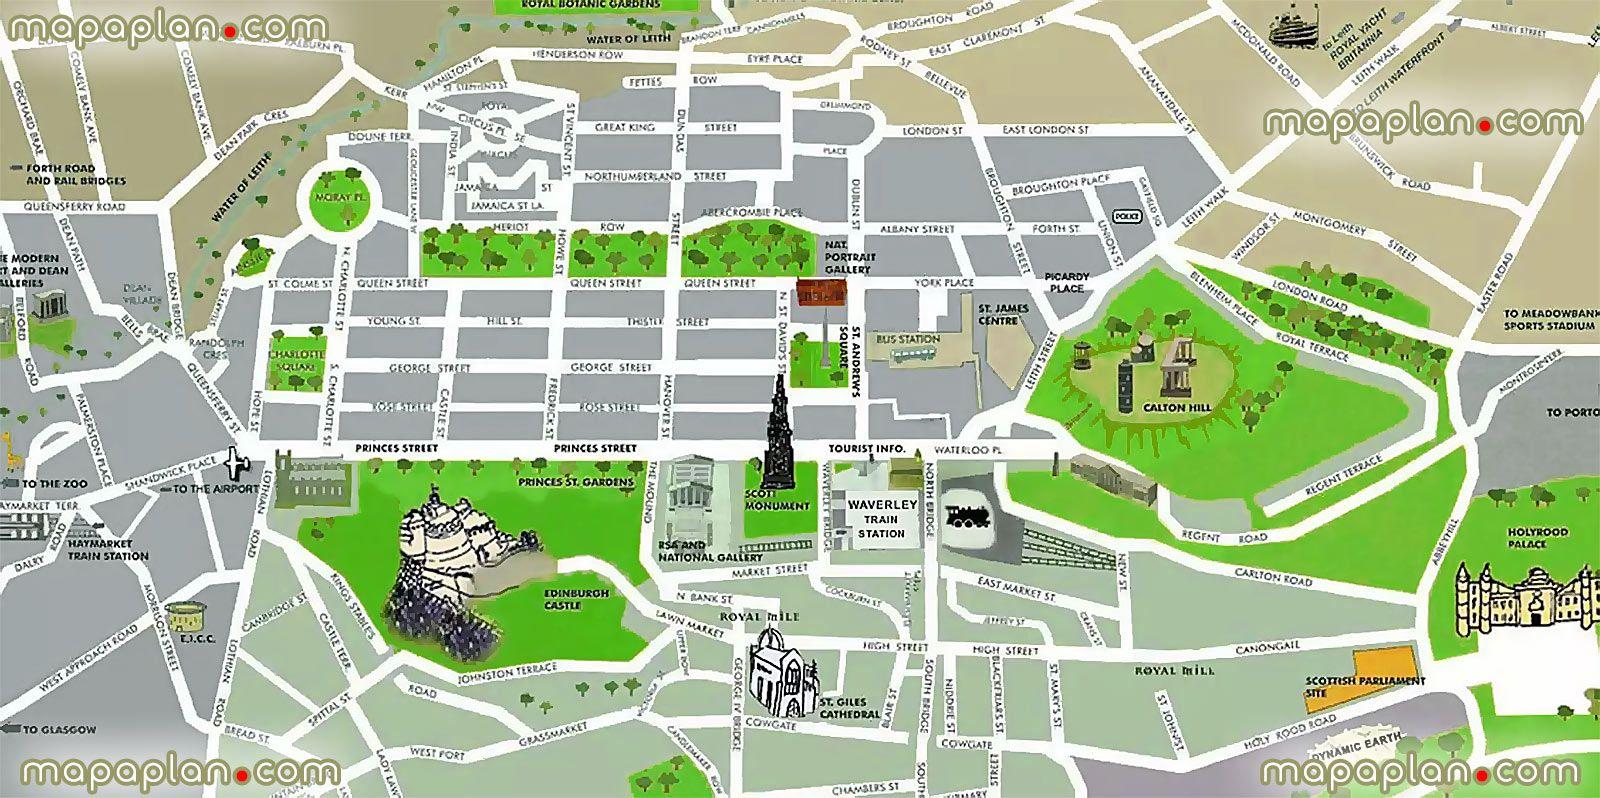 1000 images about Edinburgh printable map of top tourist – Edinburgh Tourist Map